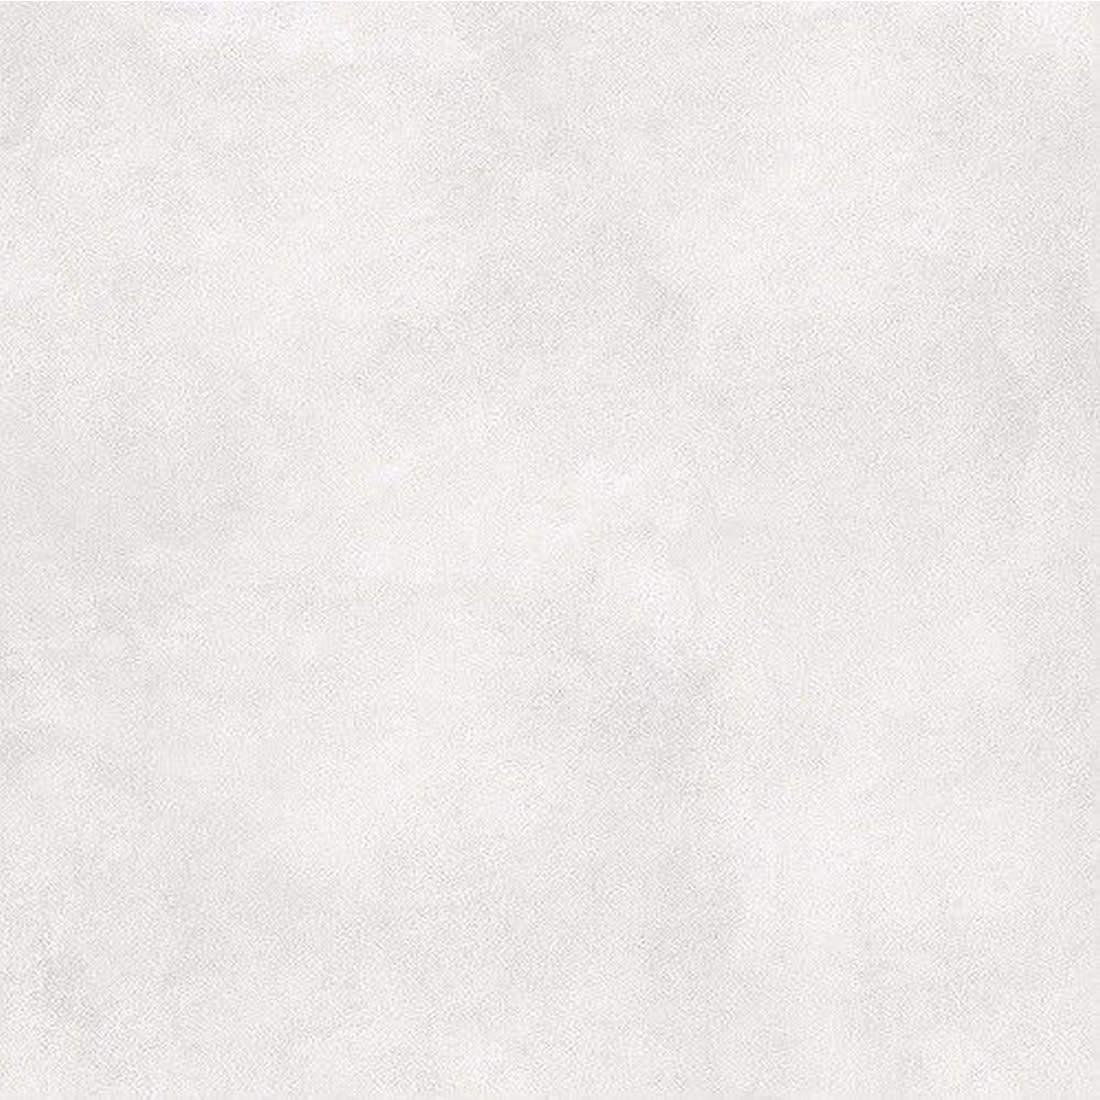 Piso Bellacer 57x57 Cimento Brilhante Ref 57043/90040